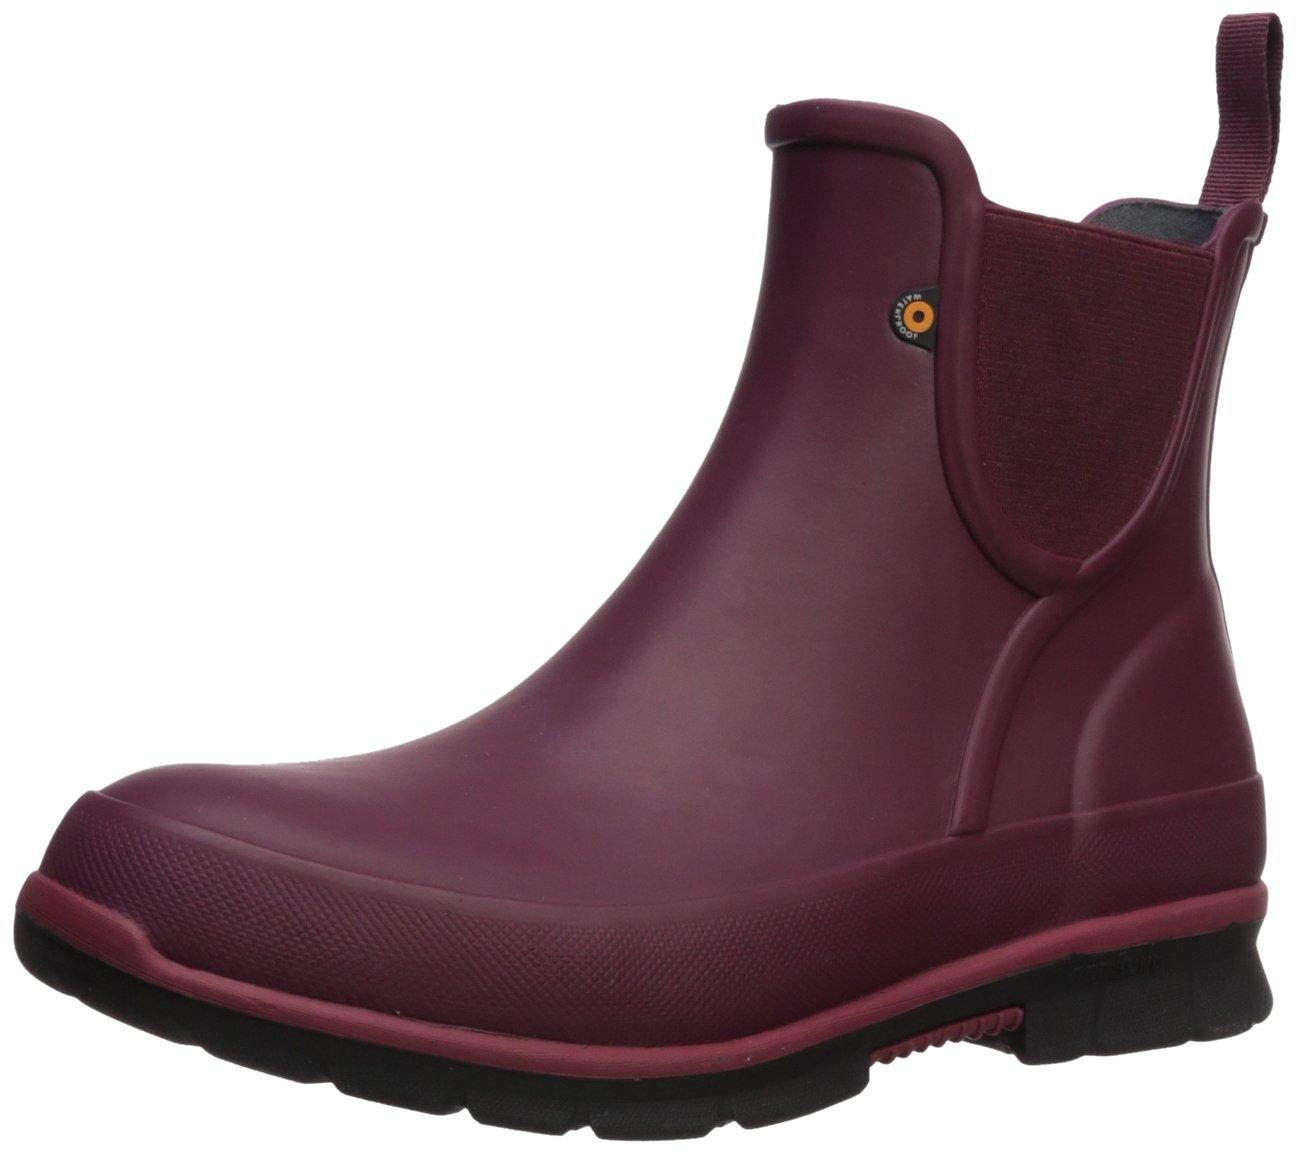 Bogs Women's Amanda Slip on Solid Rain Boot B073PJHJNQ 10 B(M) US|Burgundy